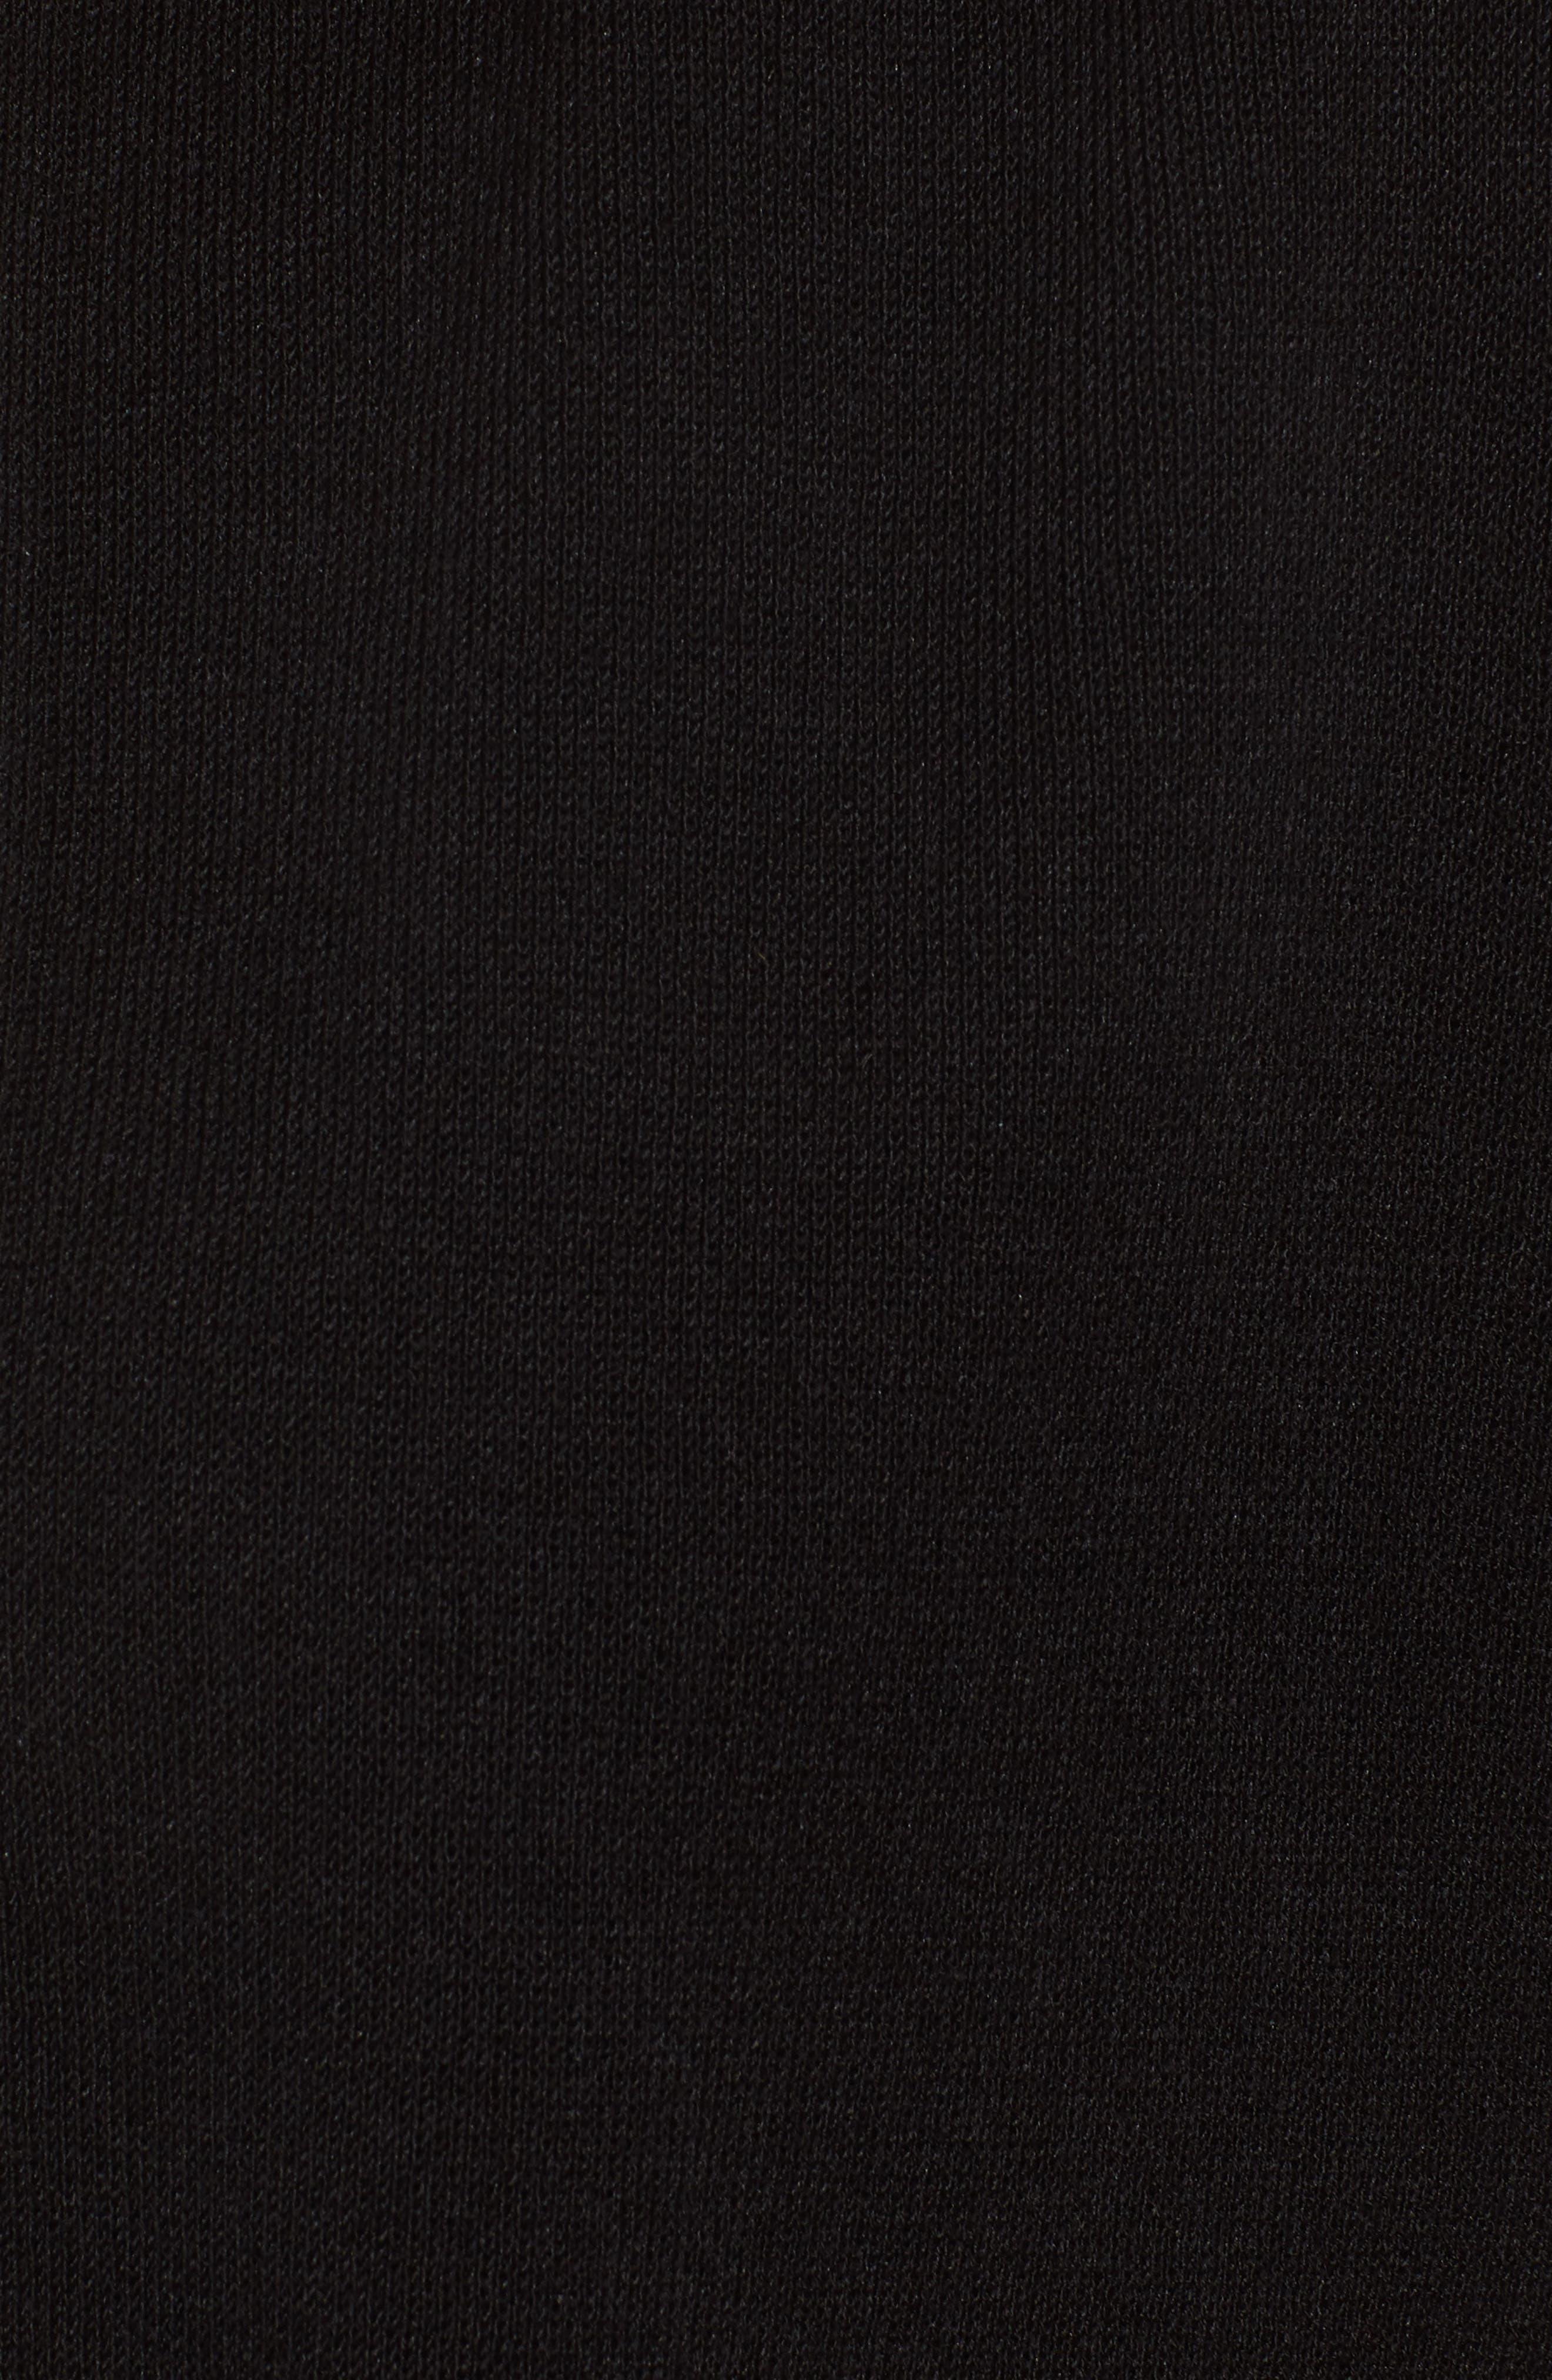 Fatildi Bolero Cardigan,                             Alternate thumbnail 5, color,                             Black